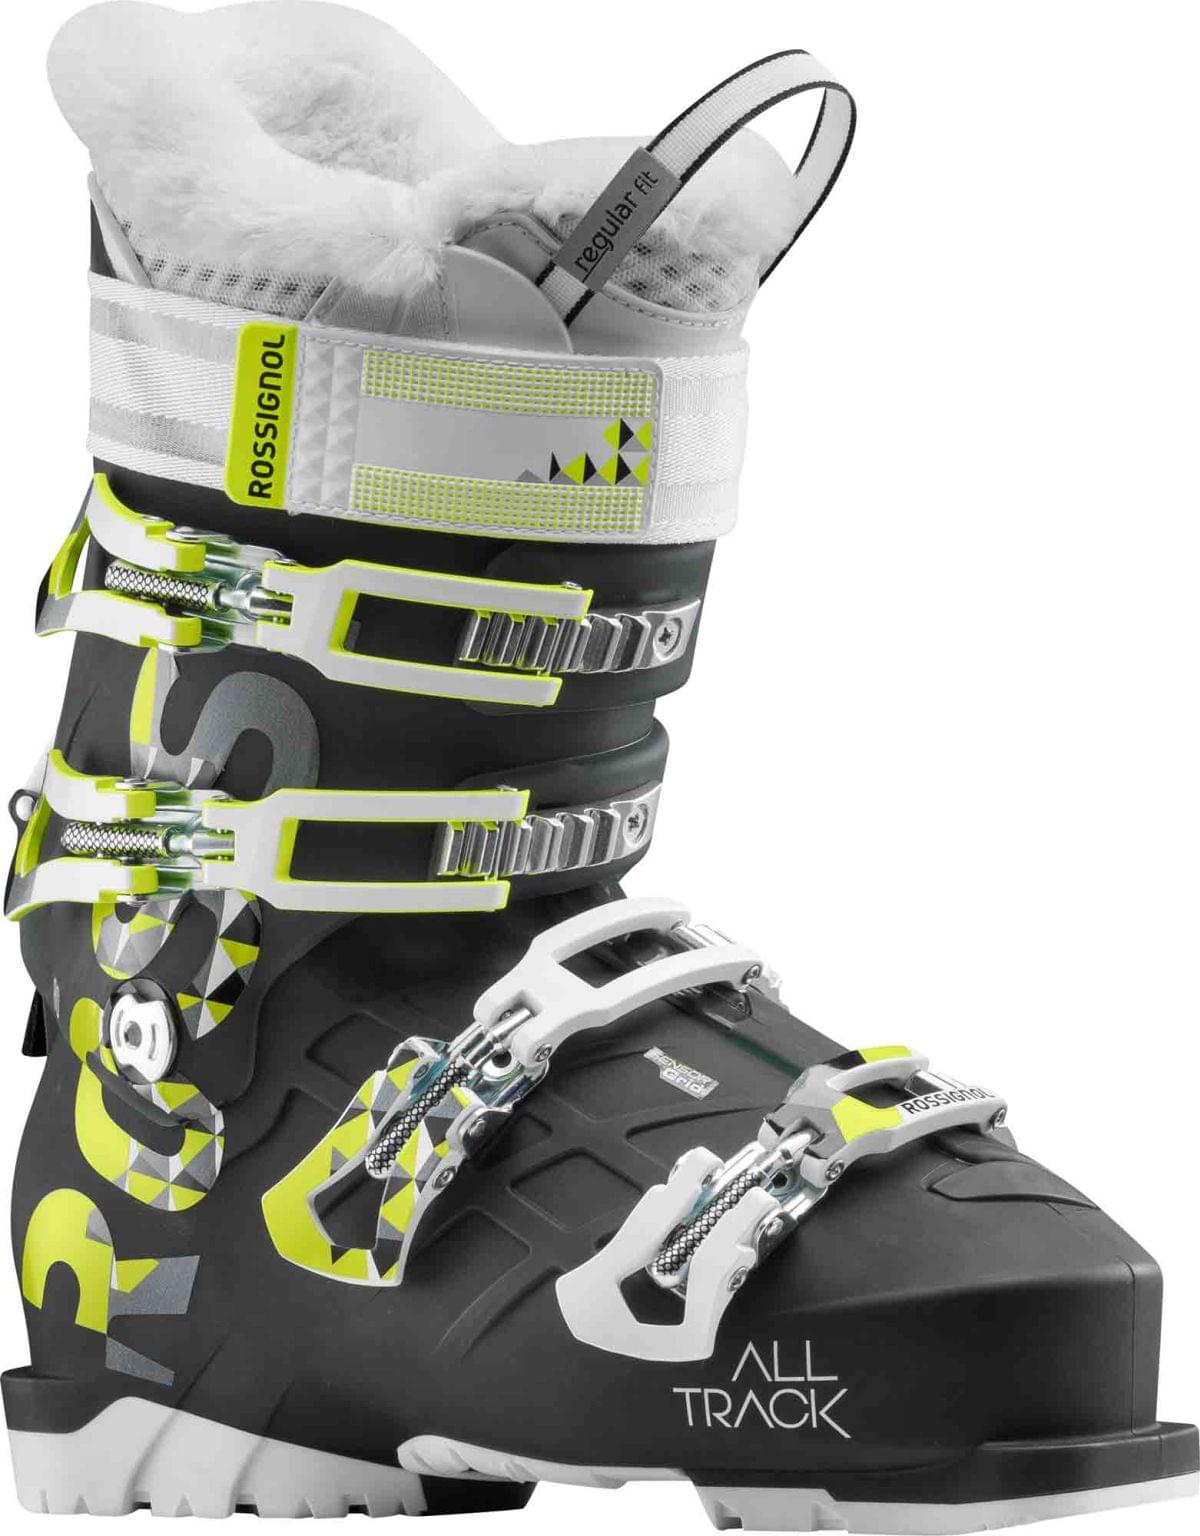 8097efad060 Dámské sjezdové boty Rossignol Alltrack 80 W black - Ski a Bike ...